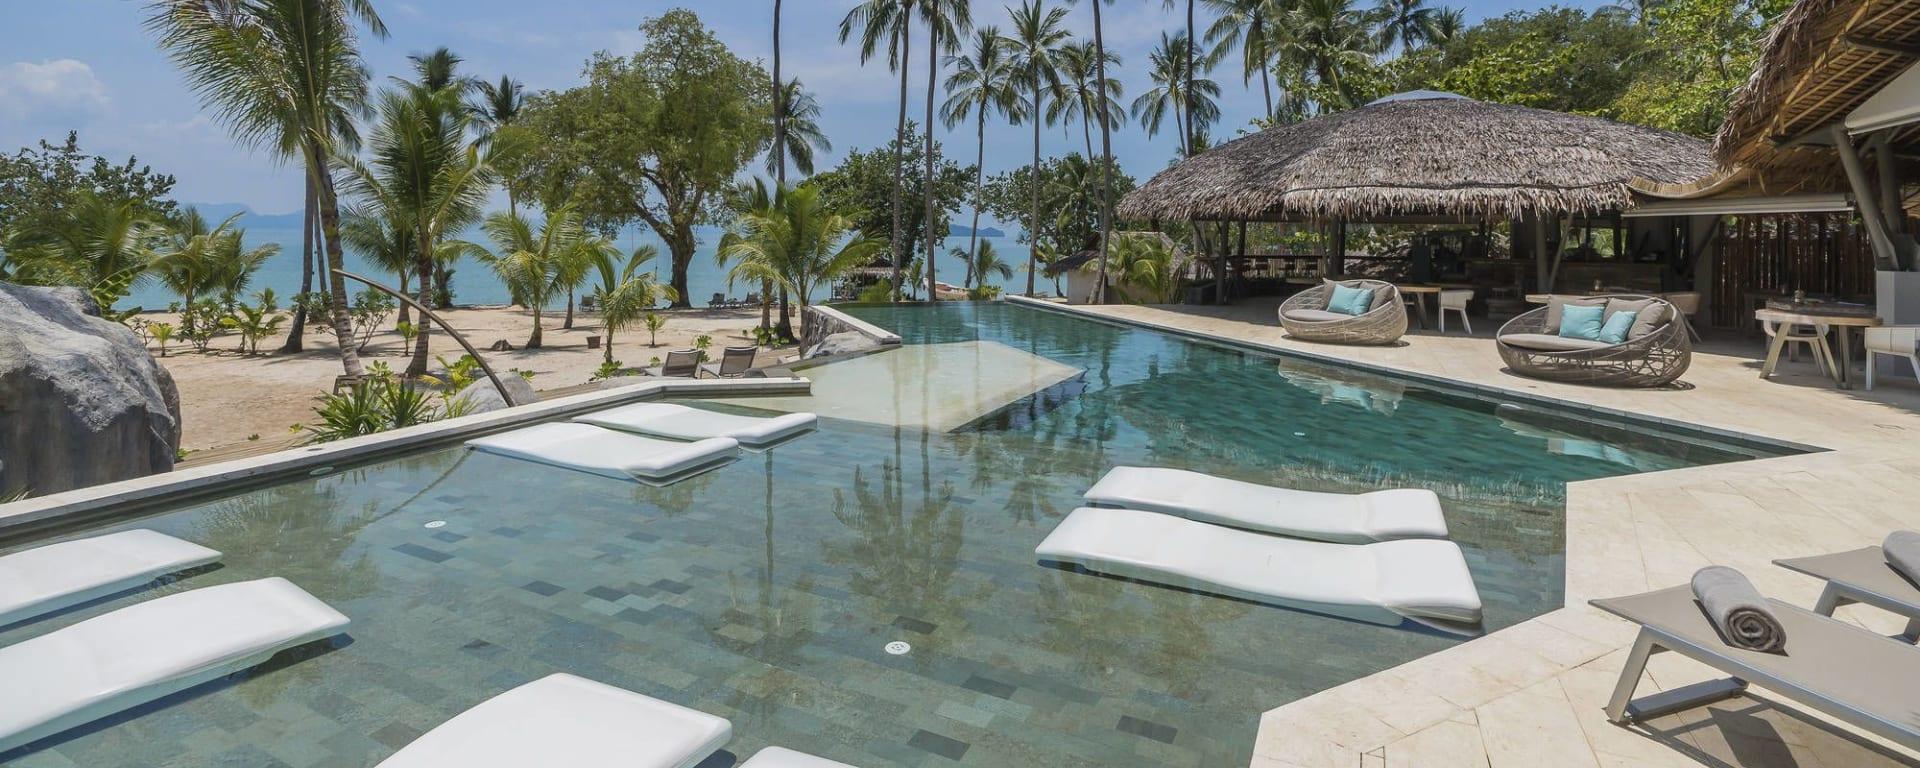 Tree House Villas Koh Yao in Ko Yao: Swimmingpool